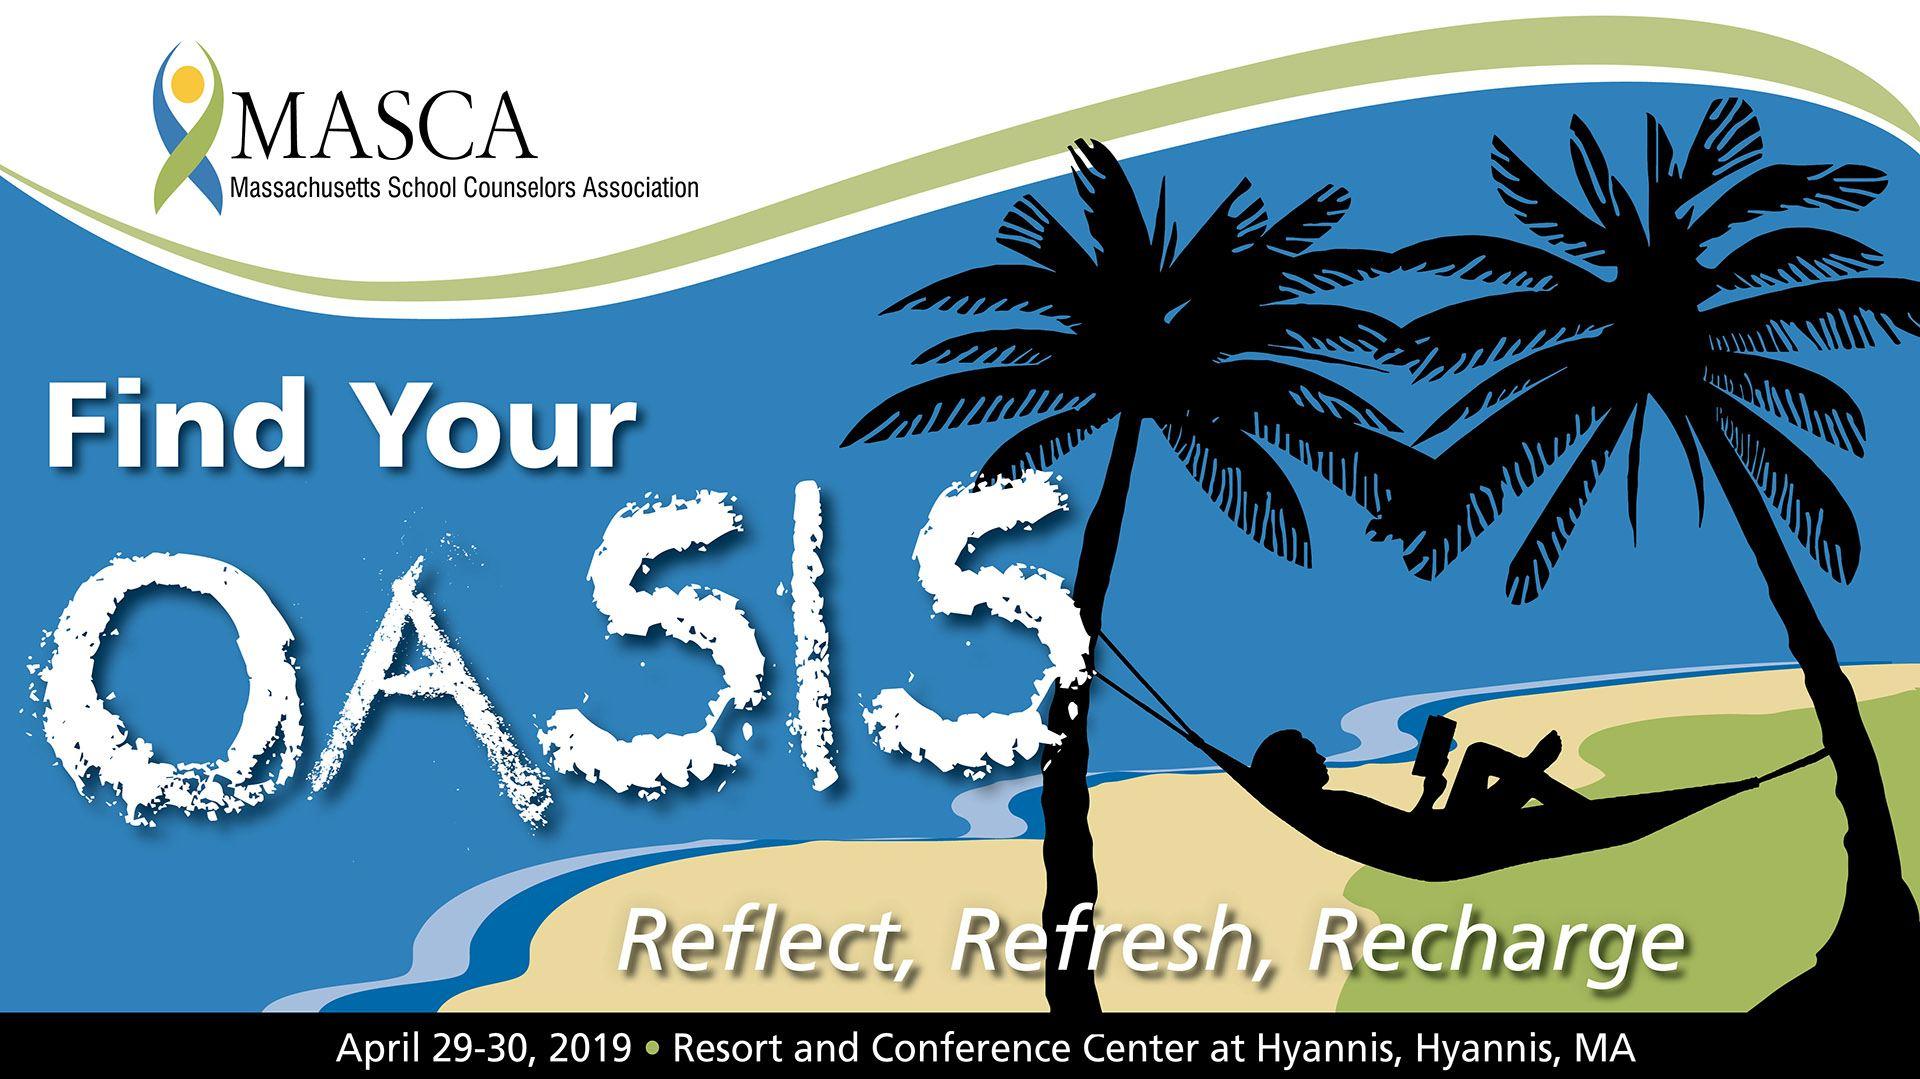 MASCA - MASCA 2019 Spring Conference